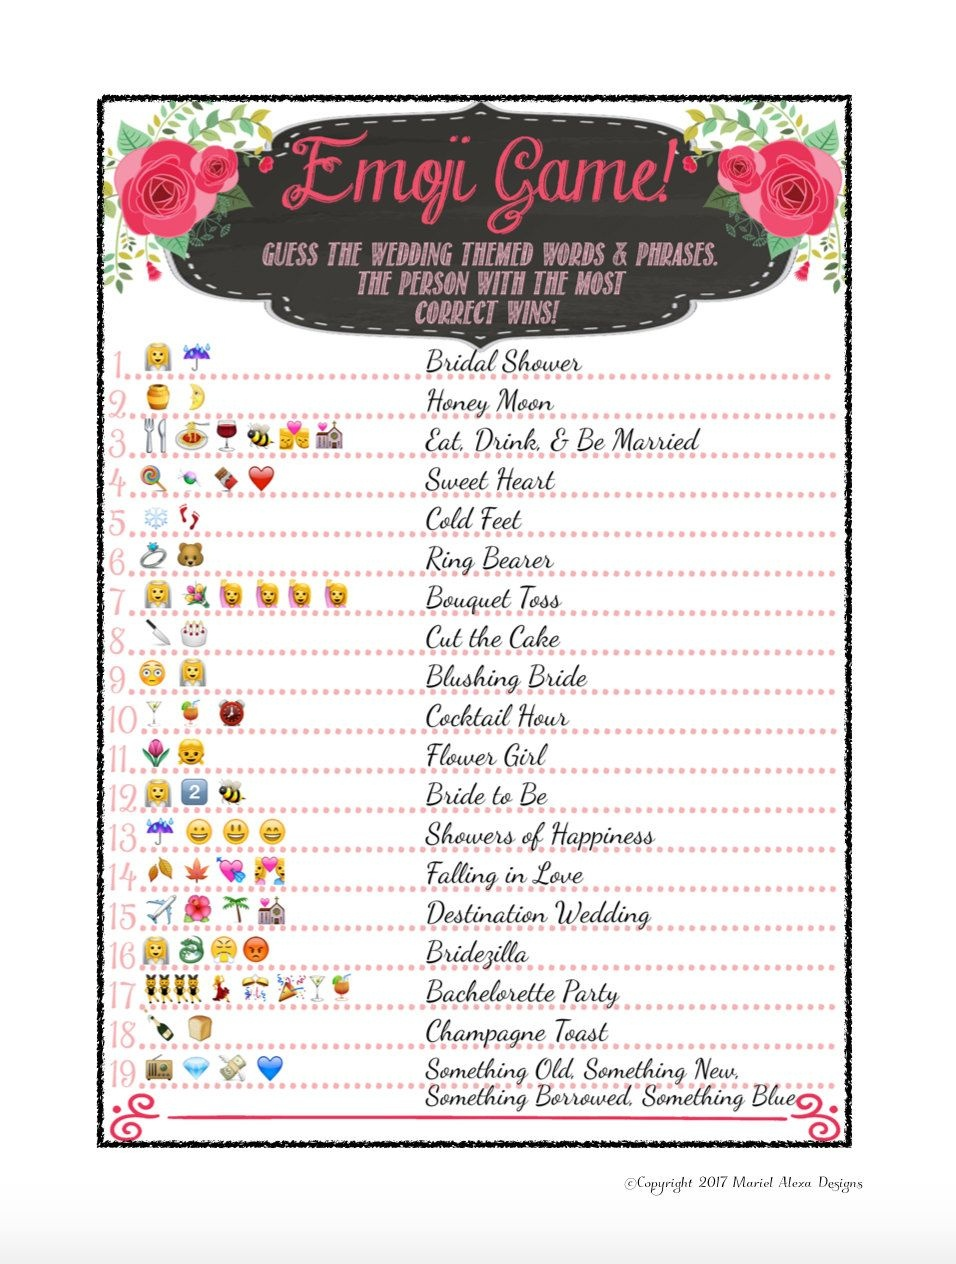 8 Free Printable Bridal Shower Games - Download Some Fun Today!   My - Wedding Emoji Pictionary Free Printable